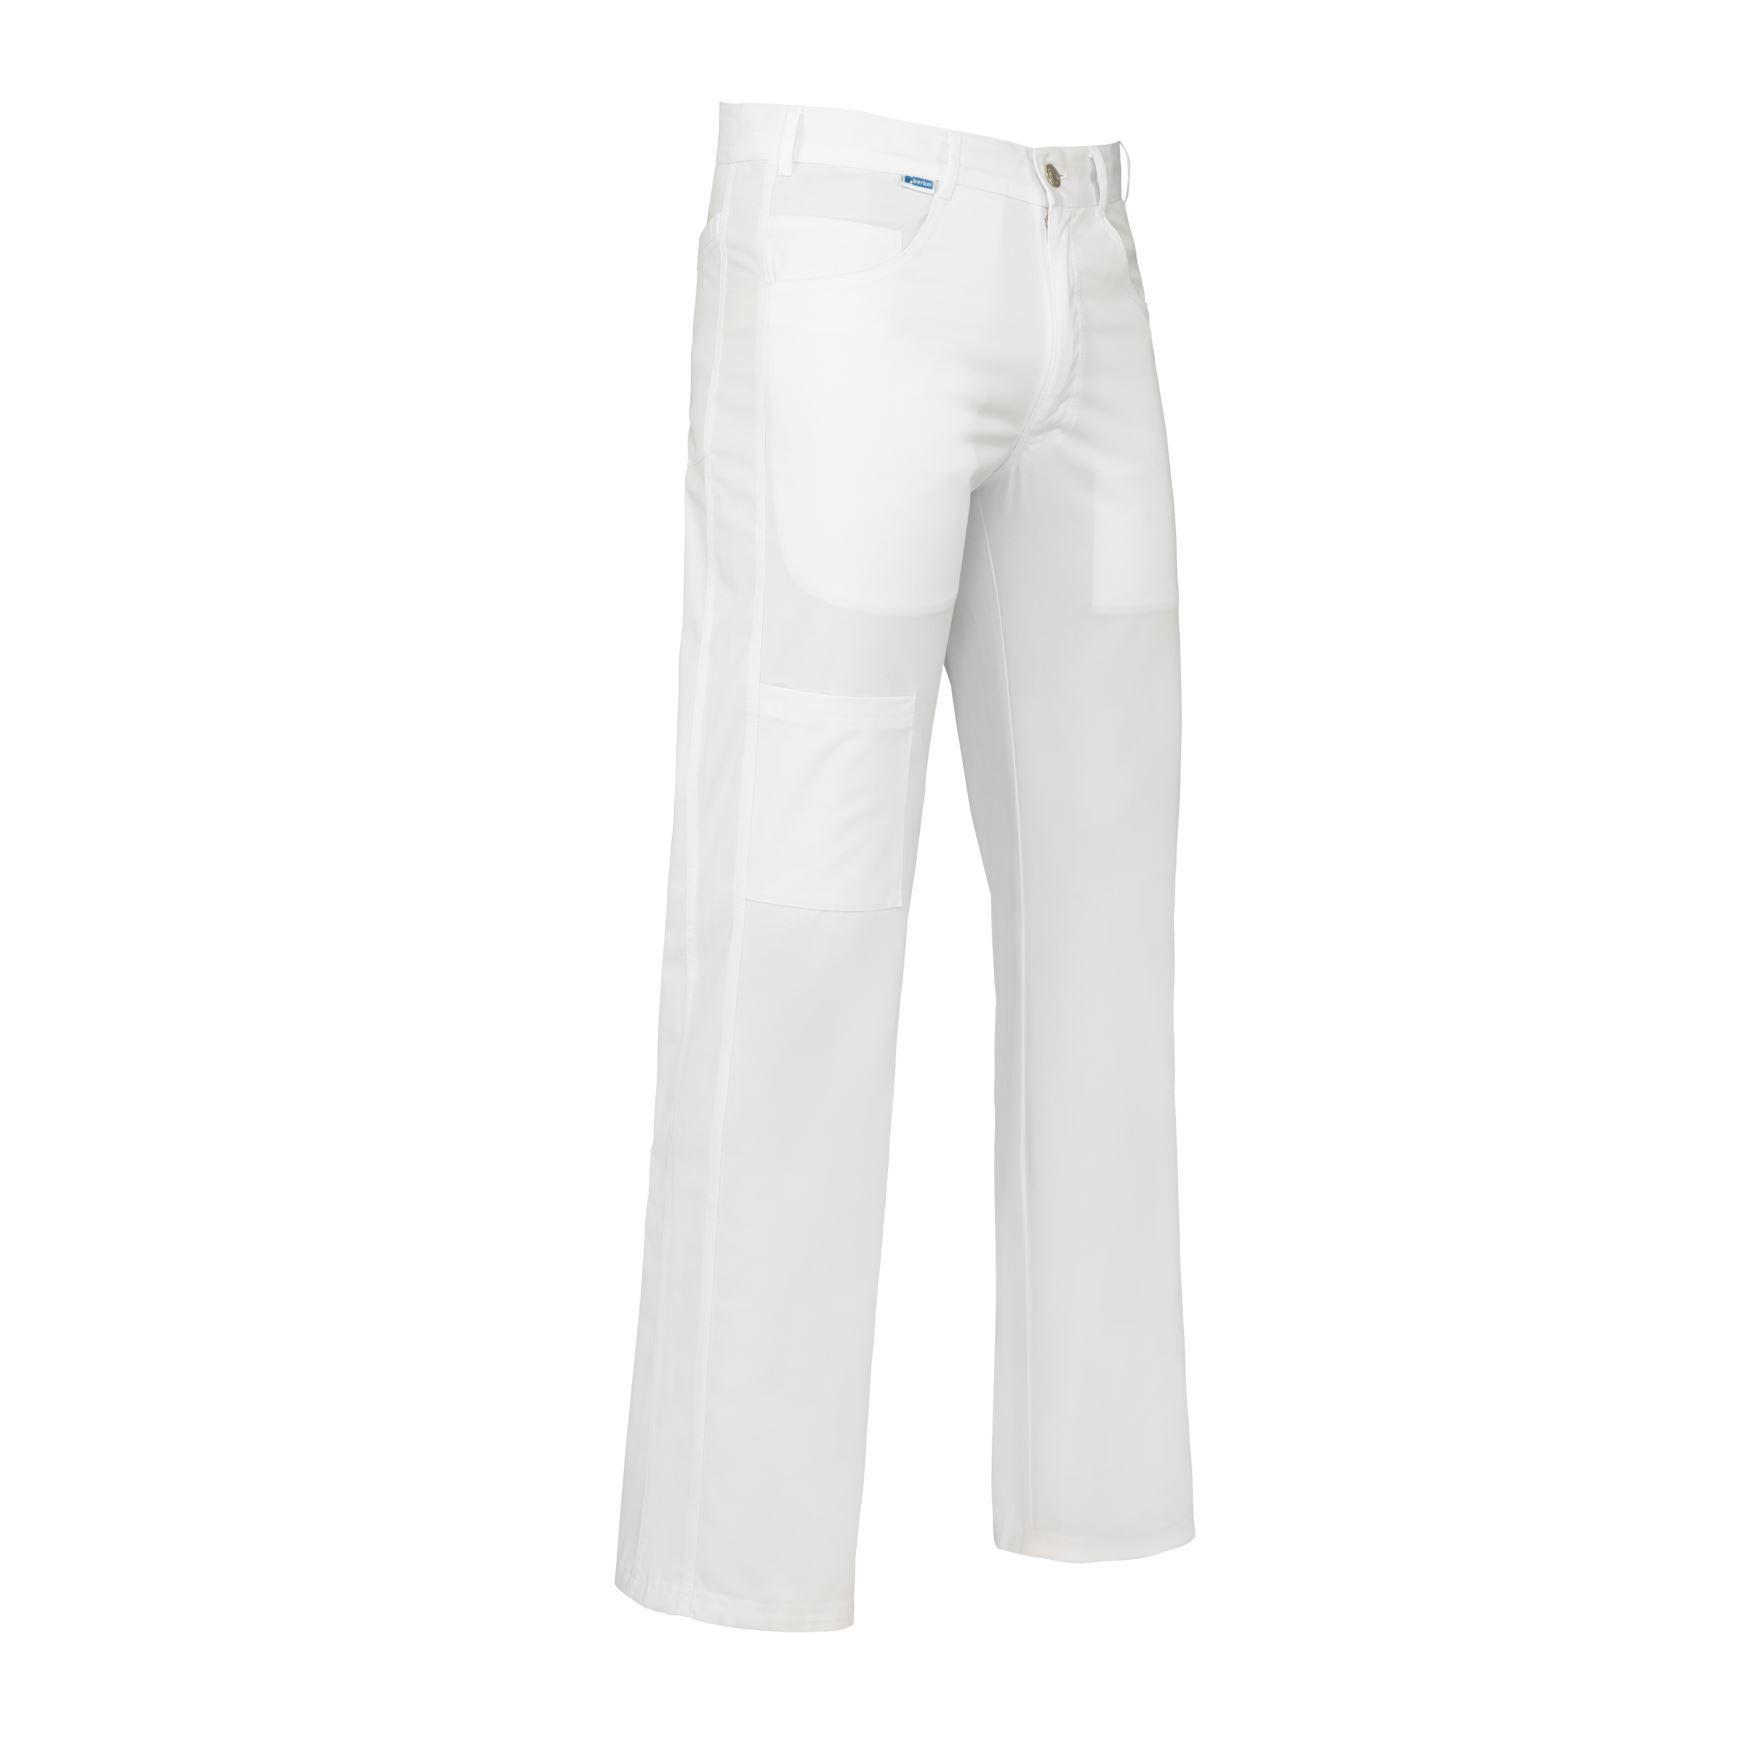 De Berkel Pantalon Max